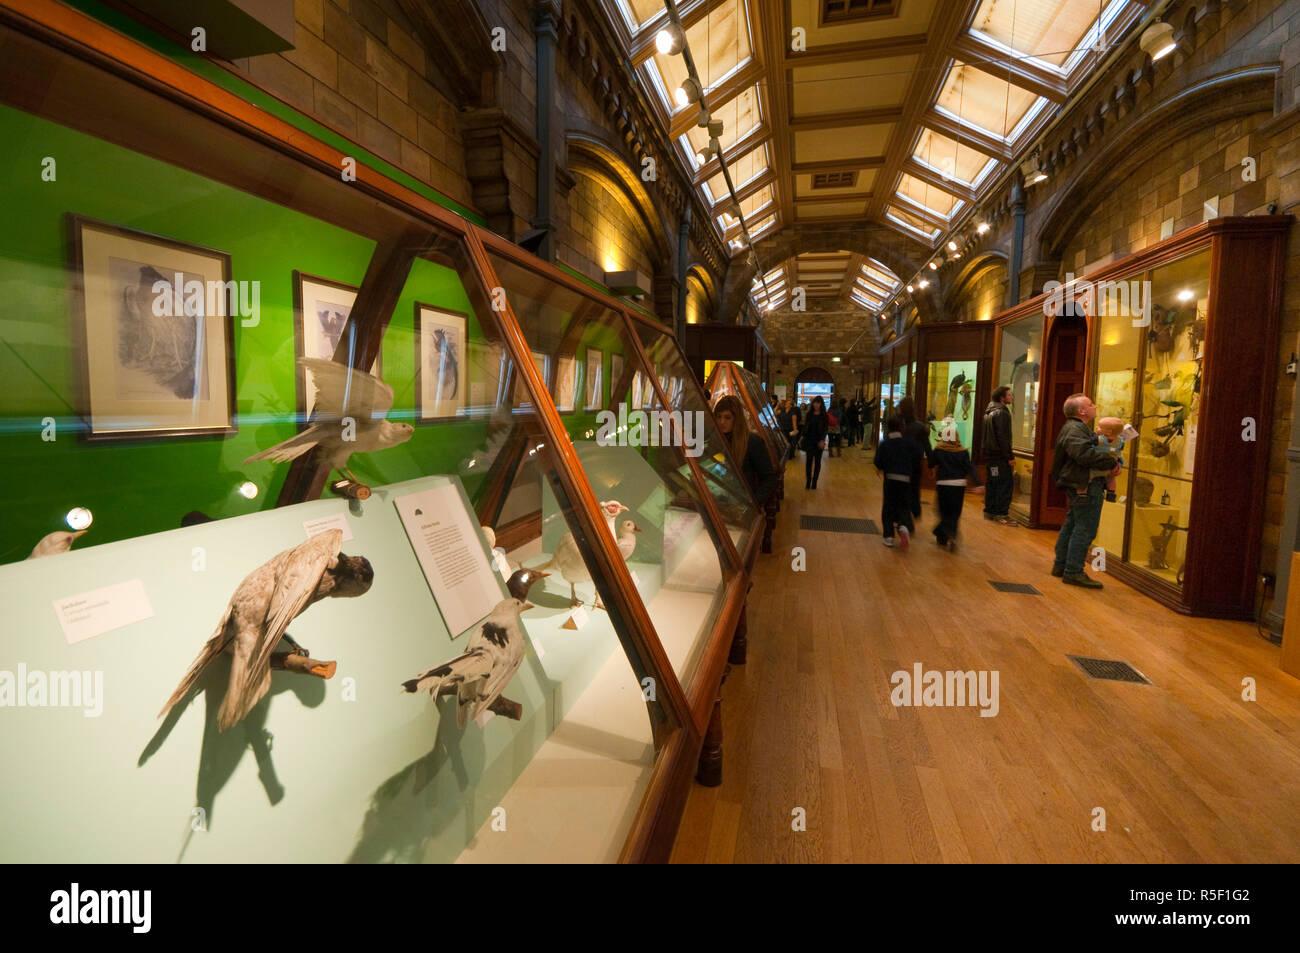 UK, Enlgland, London, South Kensington, Natural History Museum, Birds Gallery - Stock Image